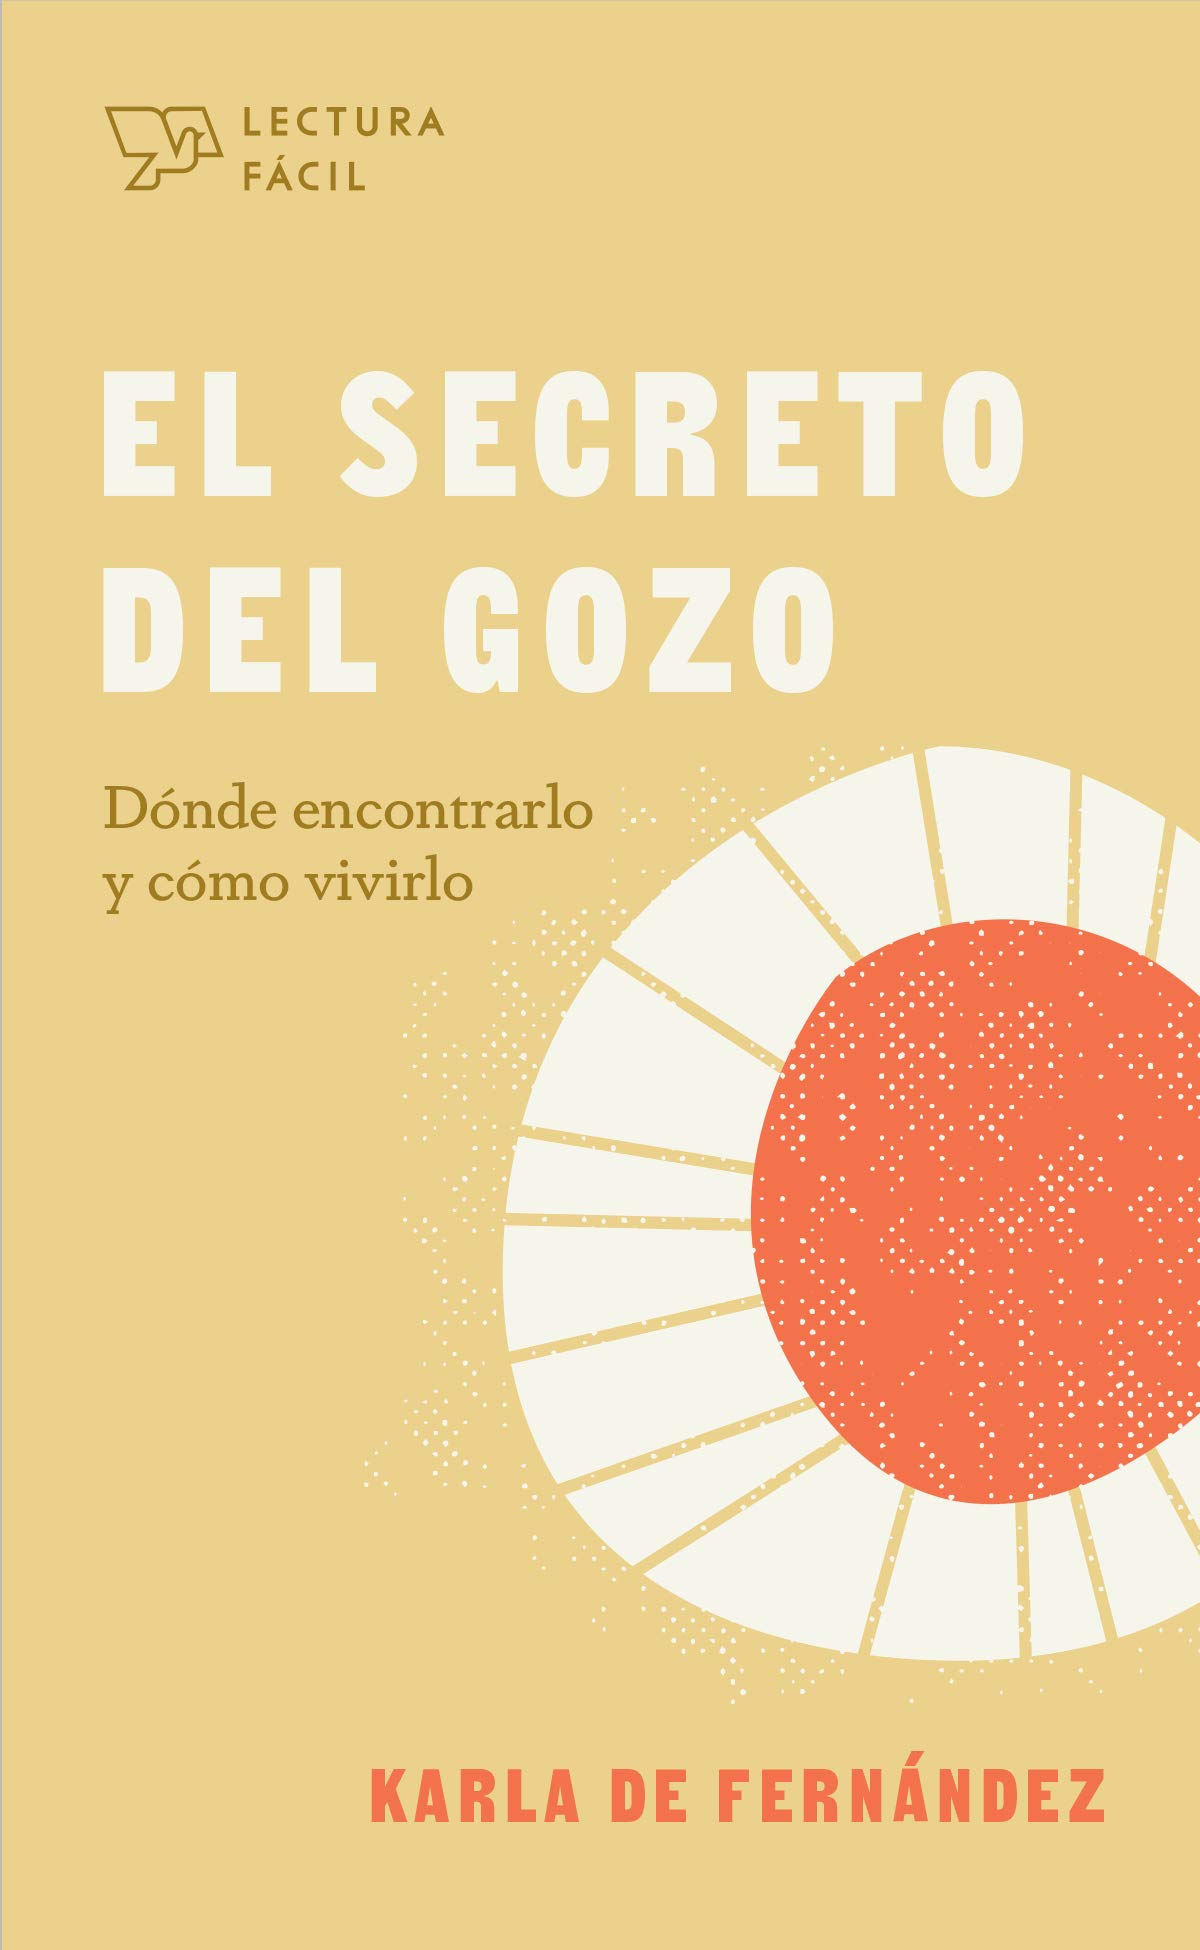 El Secreto del Gozo